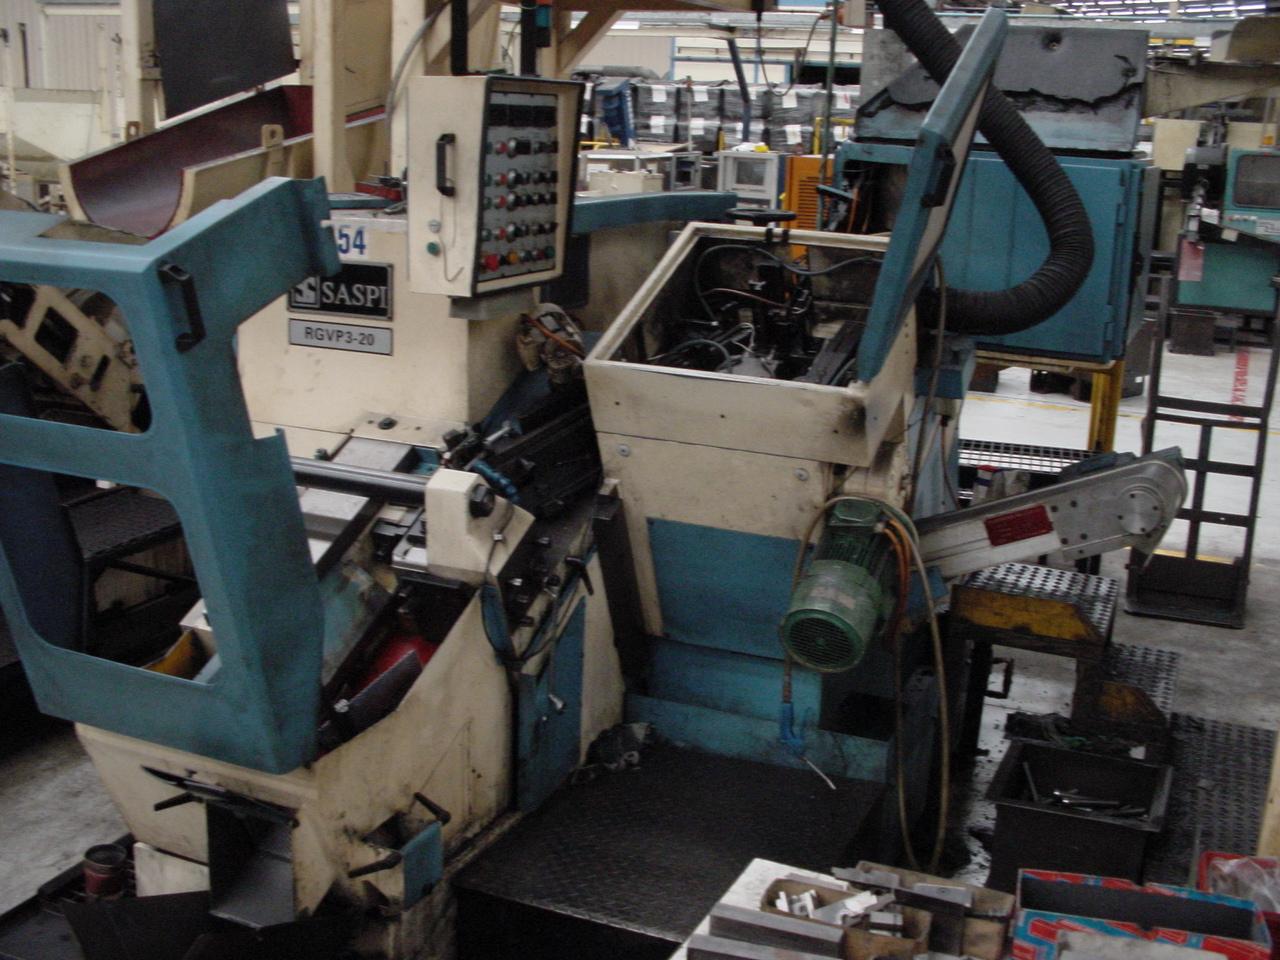 Saspi Model RGVP 3-20 Incline Automatic Thread Roller